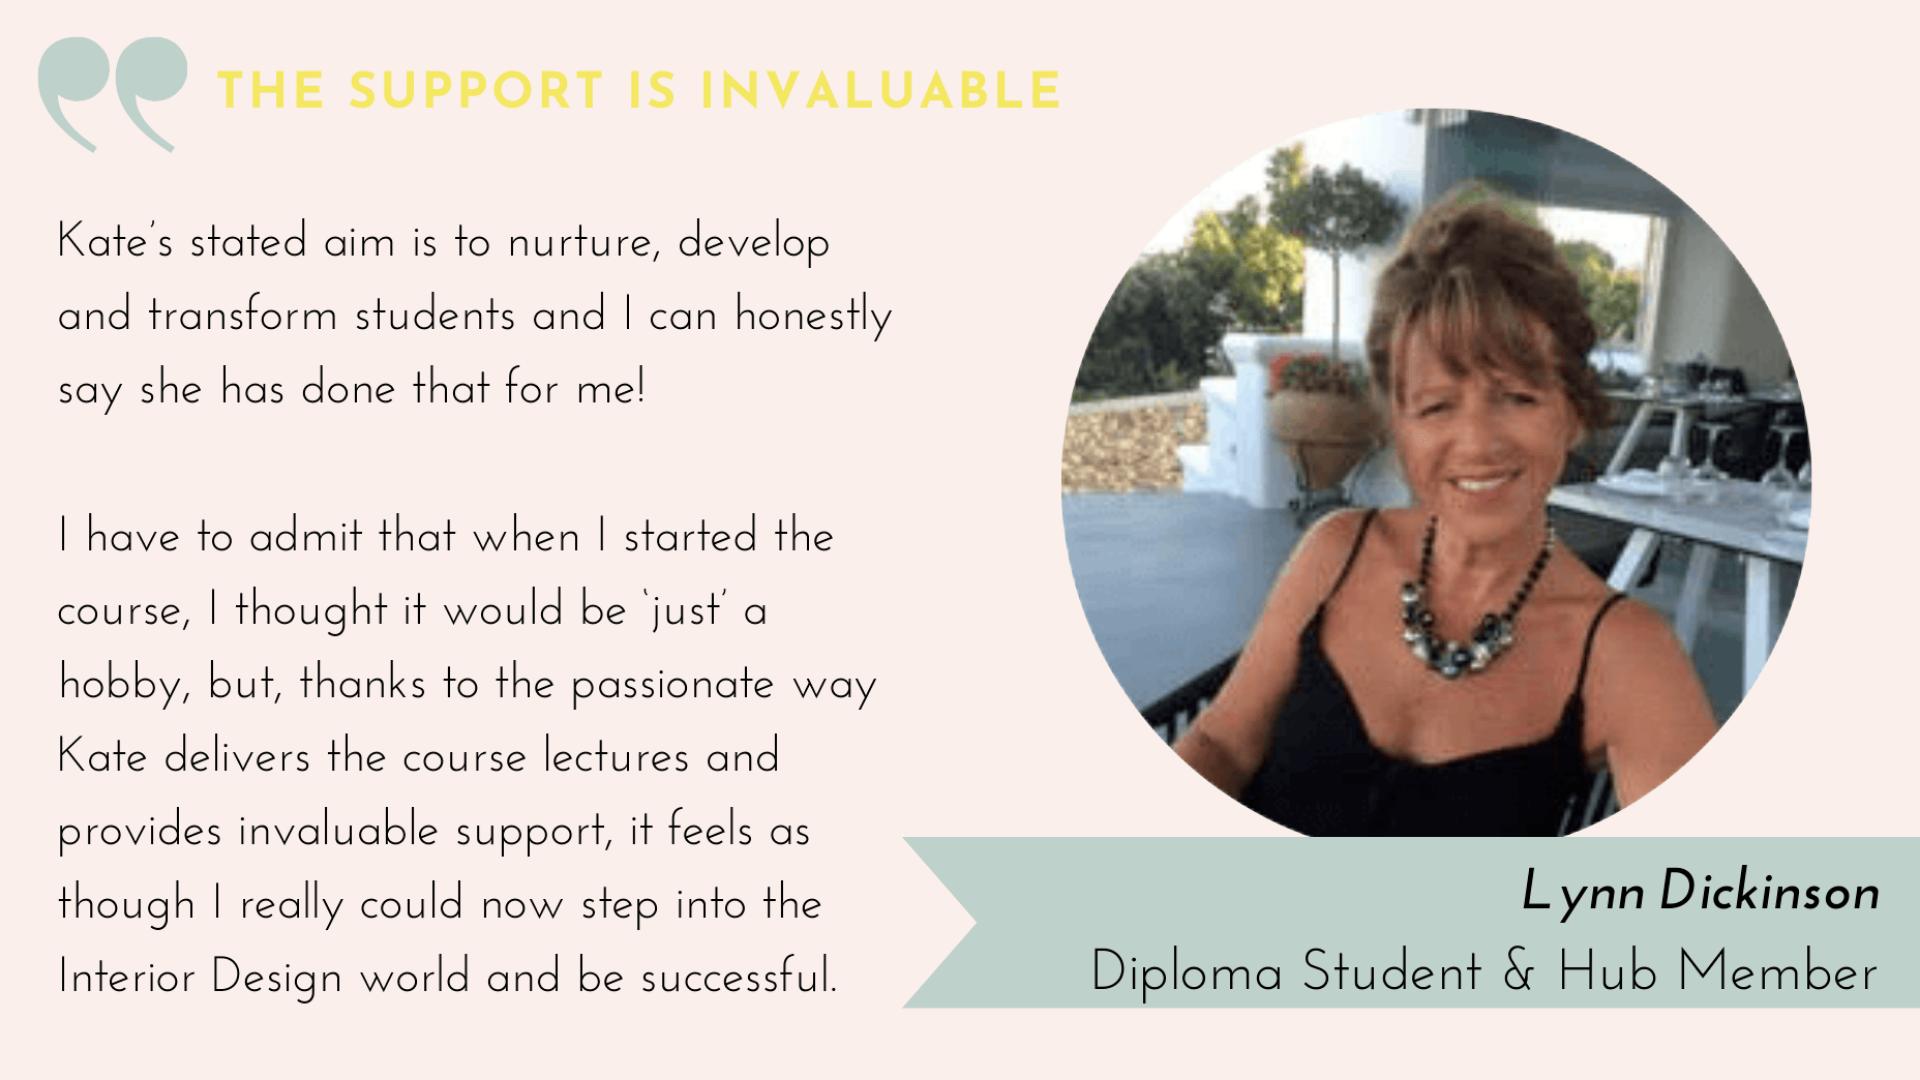 Diploma Student Lynn